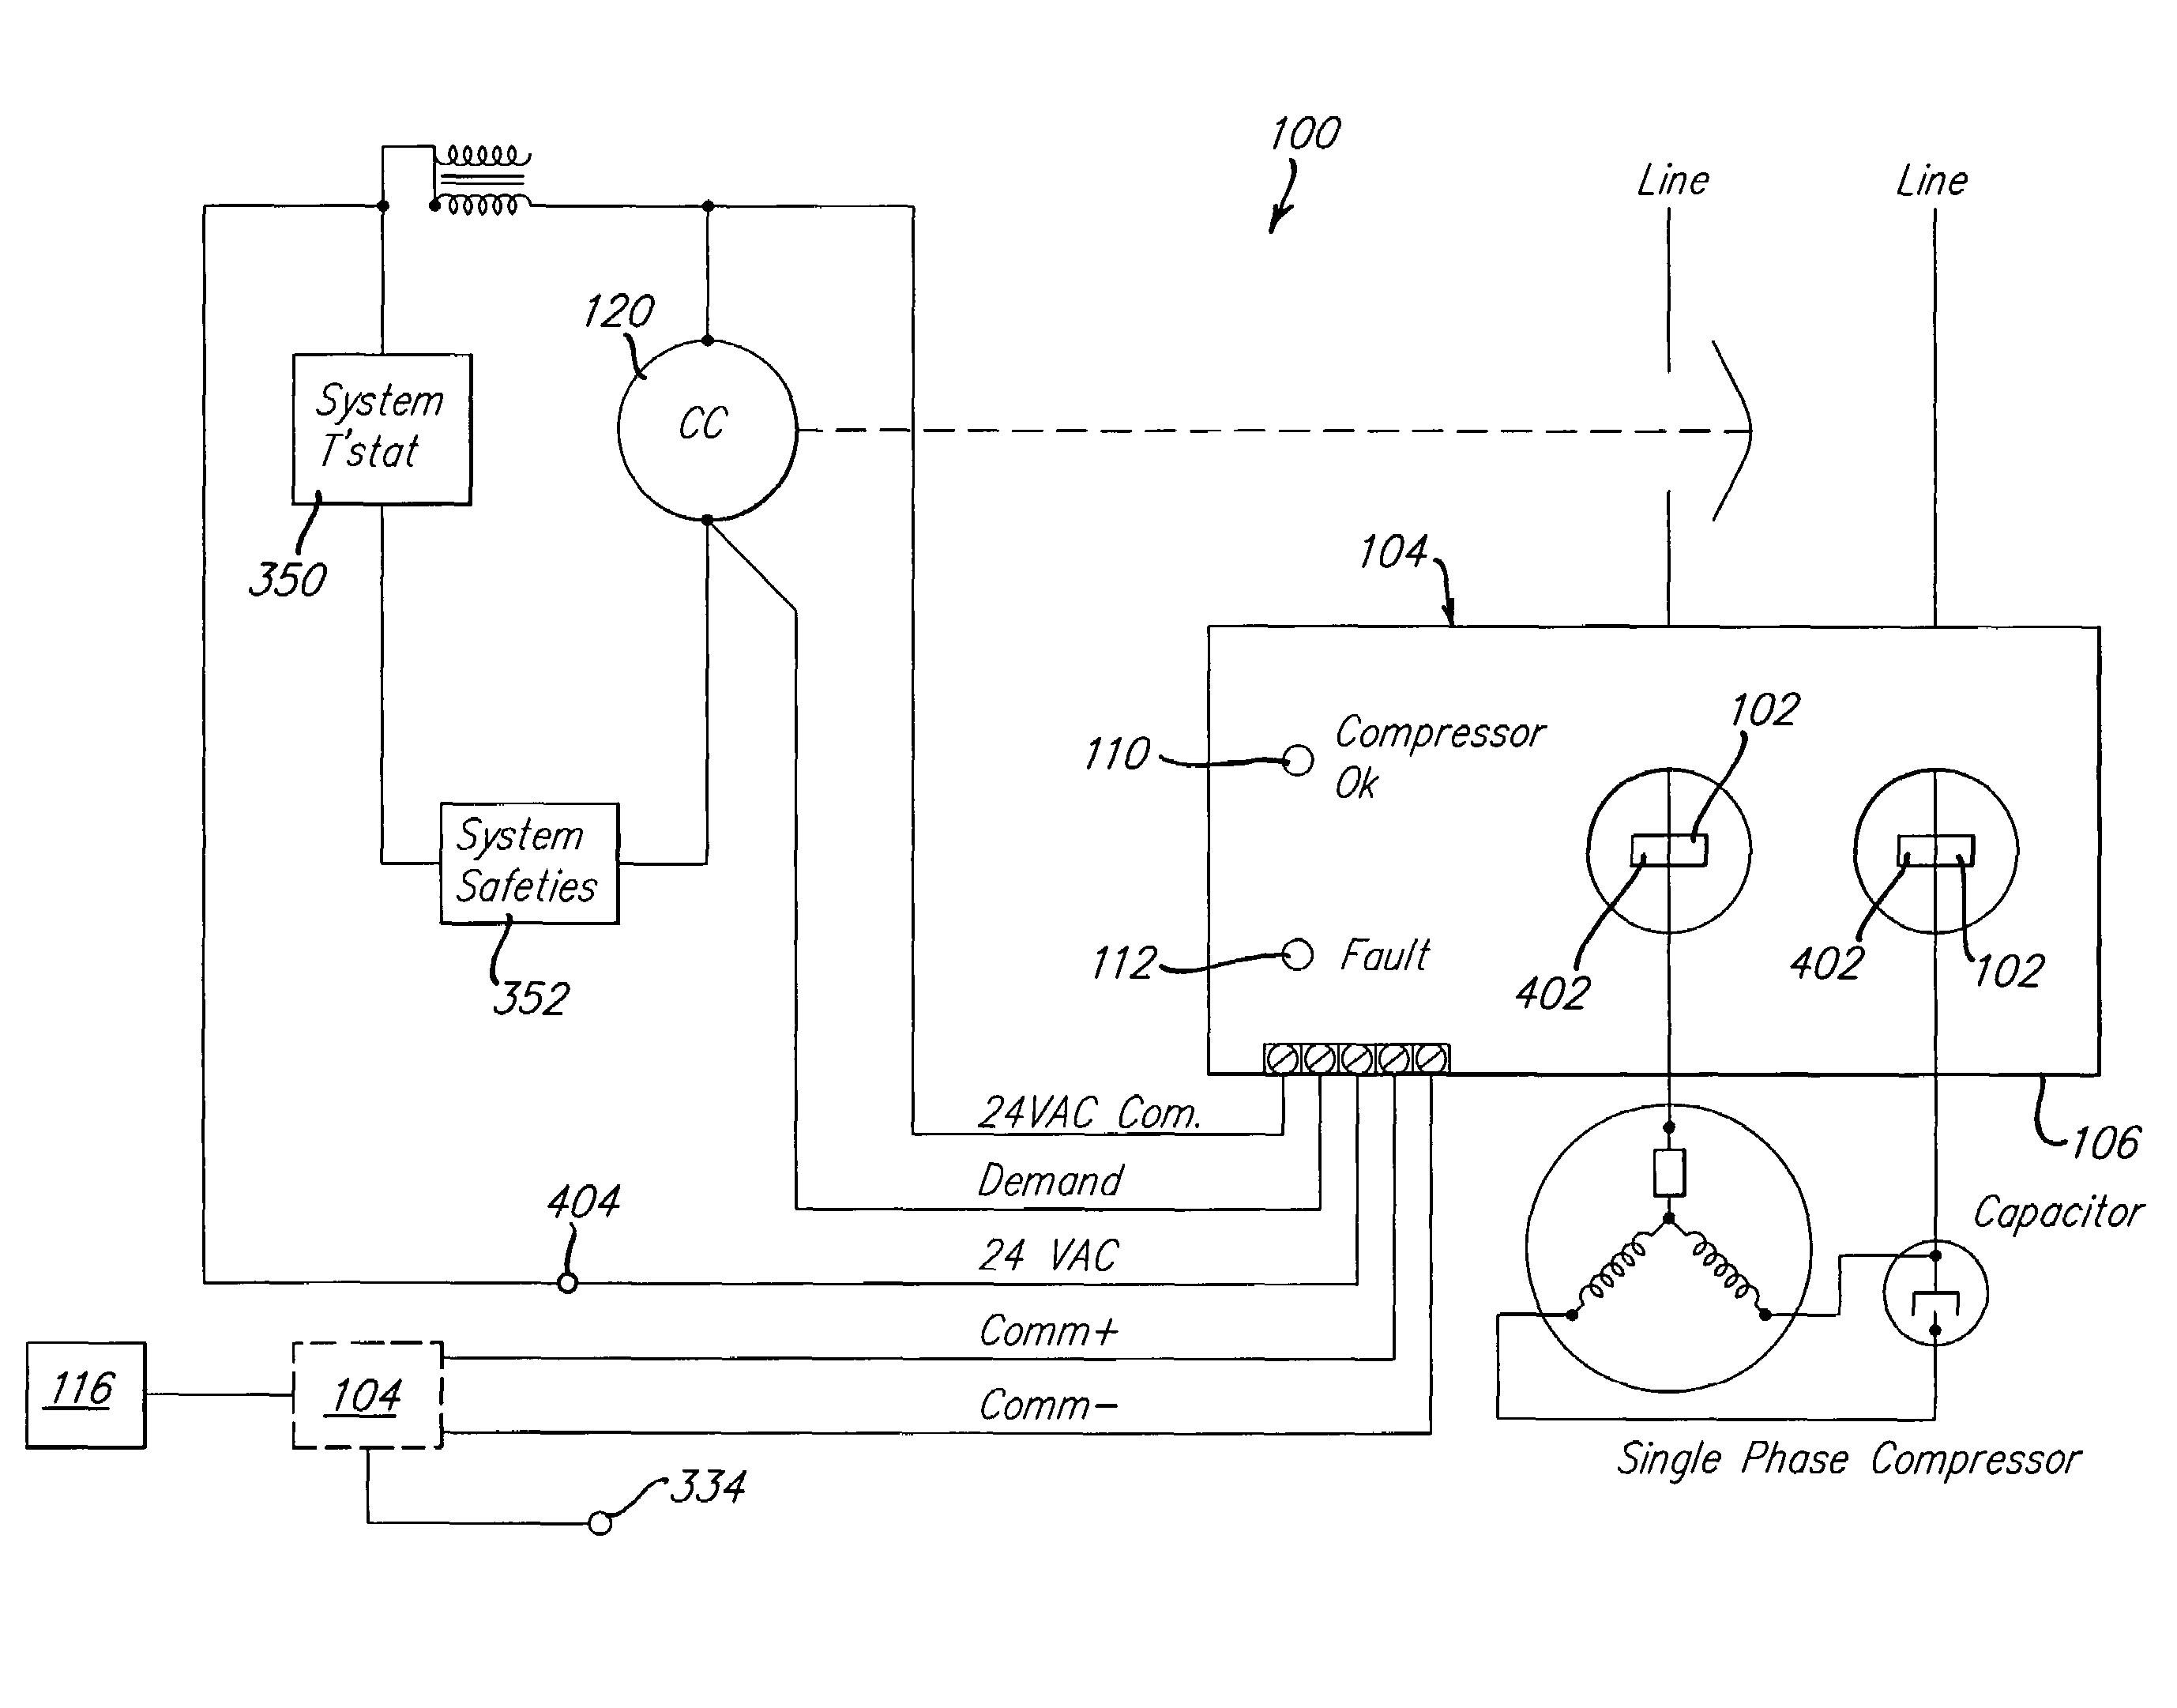 fridgemaster thermostat wiring diagram beautiful beko fridge freezer thermostat wiring diagram 4k wiki wallpapers 2018